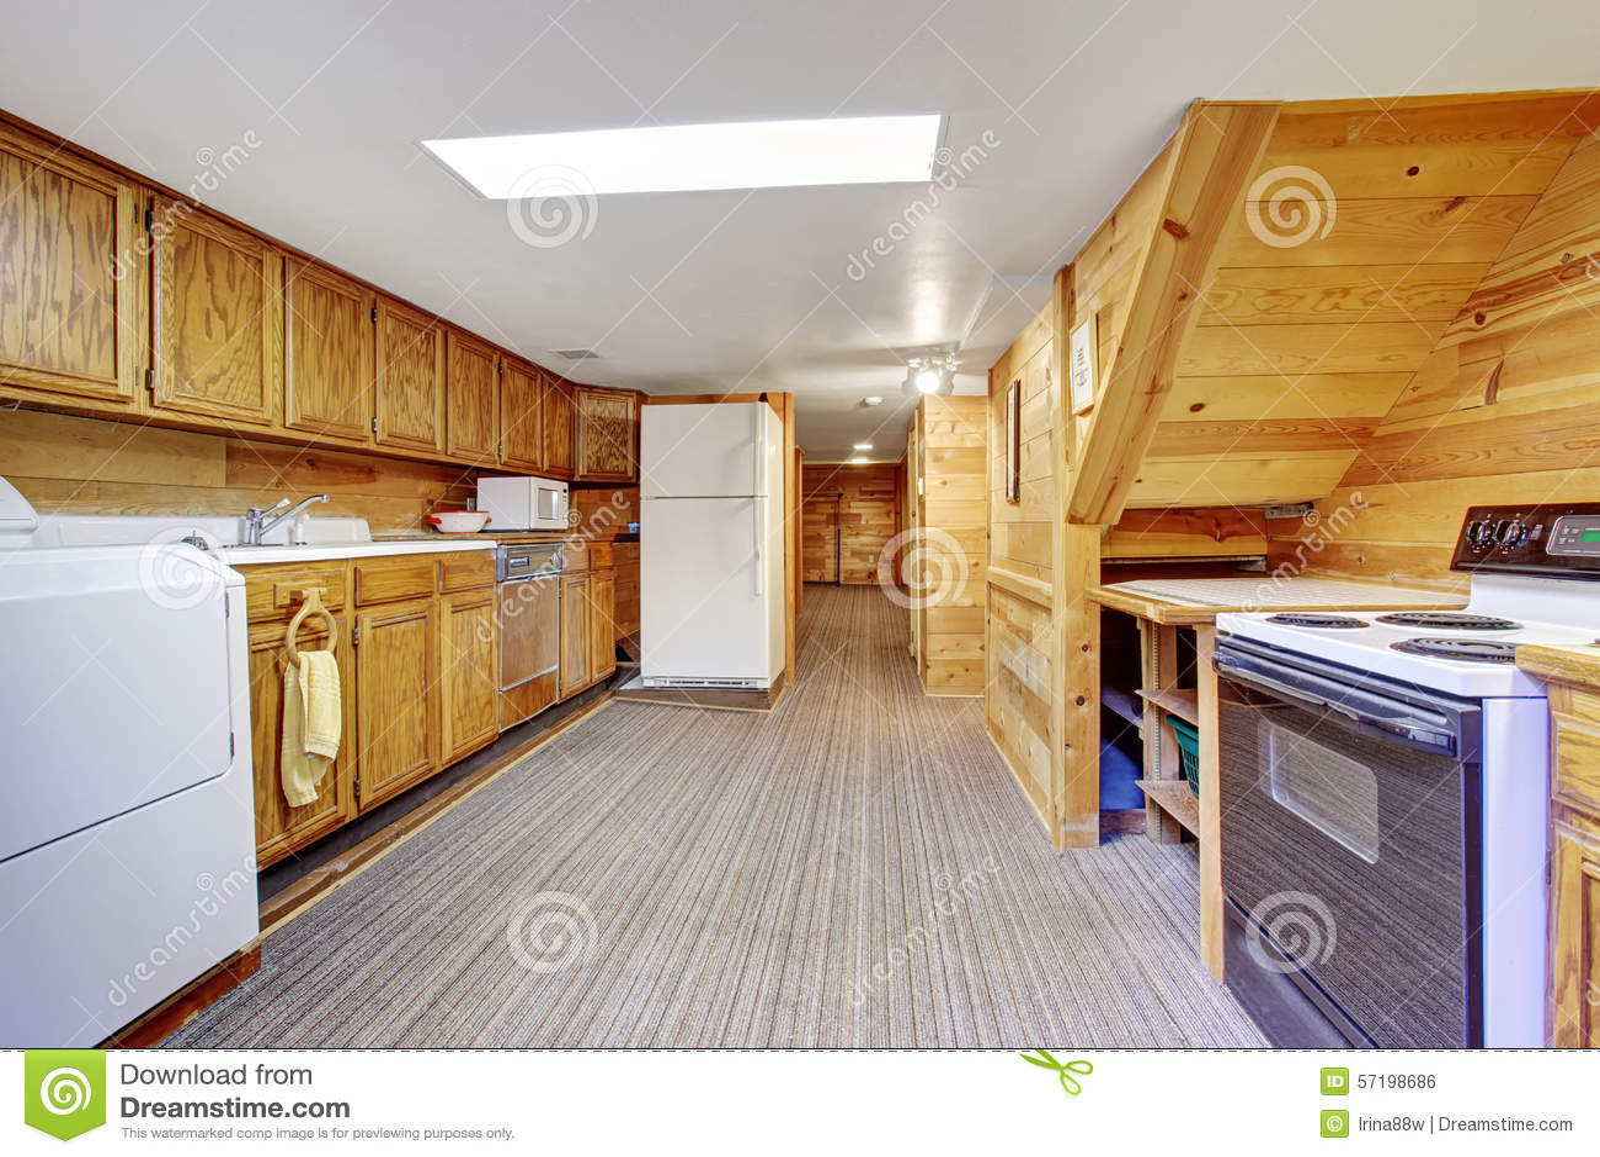 kitchen sink rugs calphalon outlet 地道厨房洗衣房组合与地毯库存照片 图片包括有干净 空间 木头 装备 autherntic厨房洗衣房组合与地毯和木头内阁